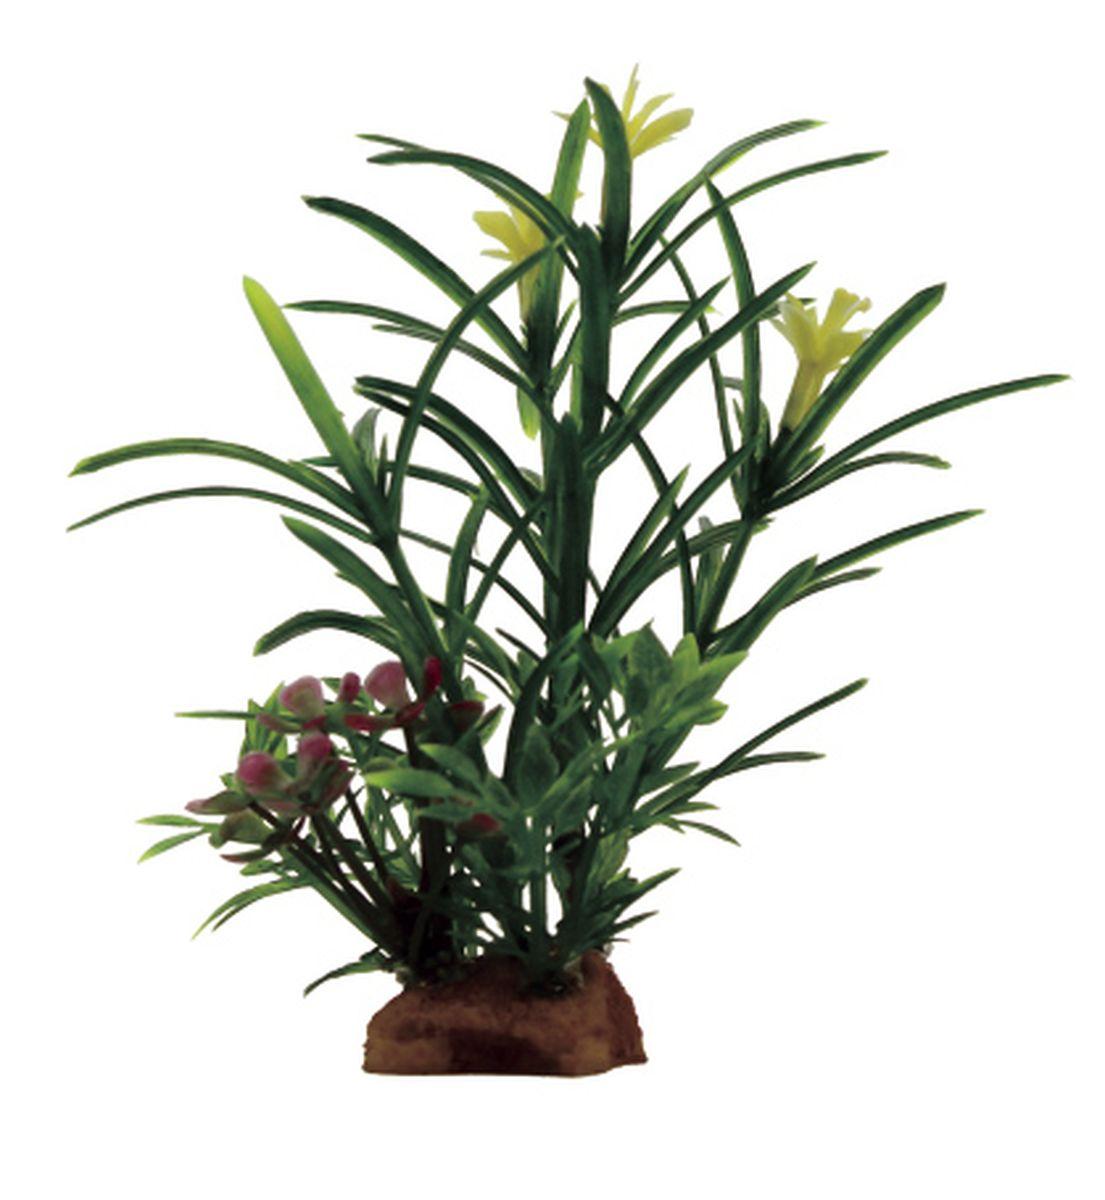 Композиция из растений для аквариума ArtUniq Эустералис, 8 x 7 x 14 смART-1130913Композиция из растений для аквариума ArtUniq Эустералис, 8 x 7 x 14 см